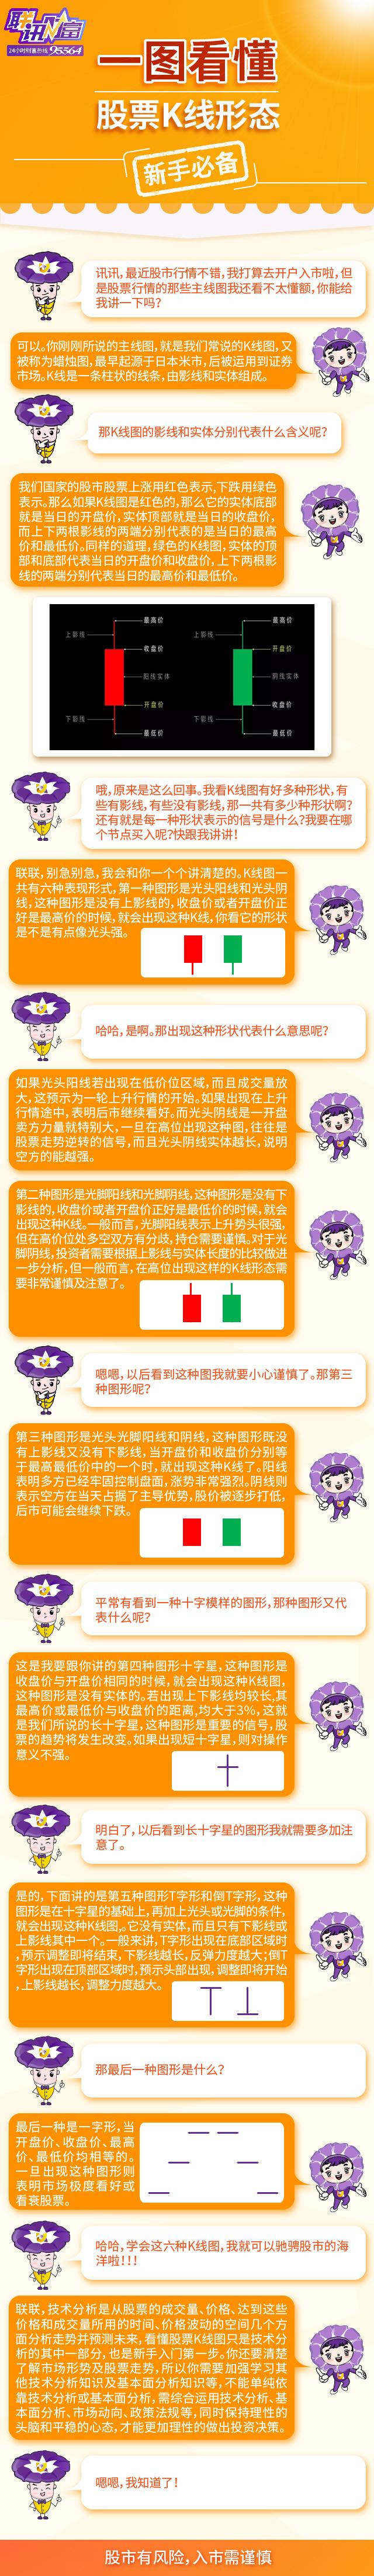 http://www.lxsec.com/upload4education/eduArt/一图看懂股票K线形态.jpg